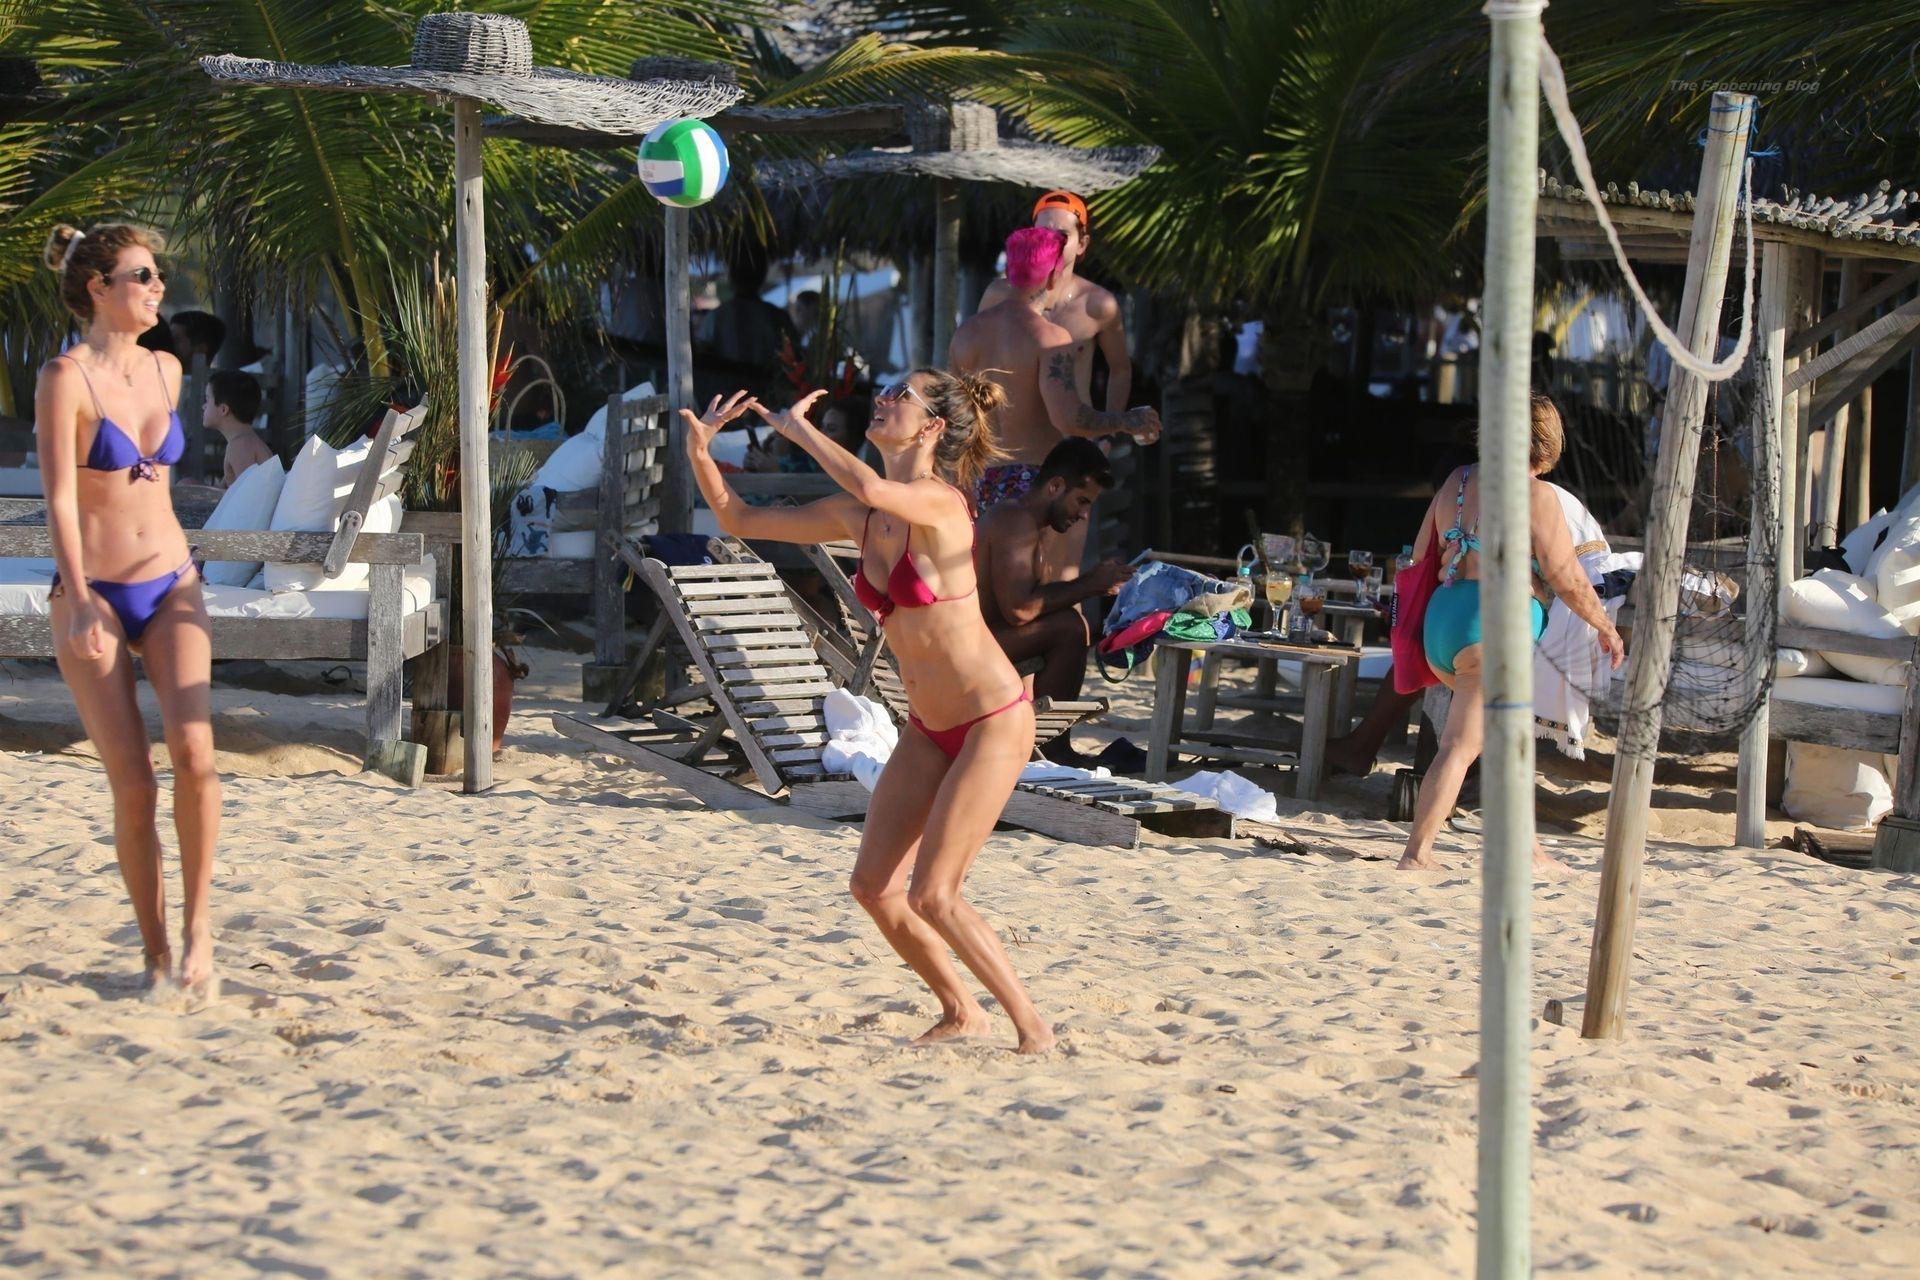 Alessandra-Ambrosio-Sexy-106-thefappeningblog.com_.jpg